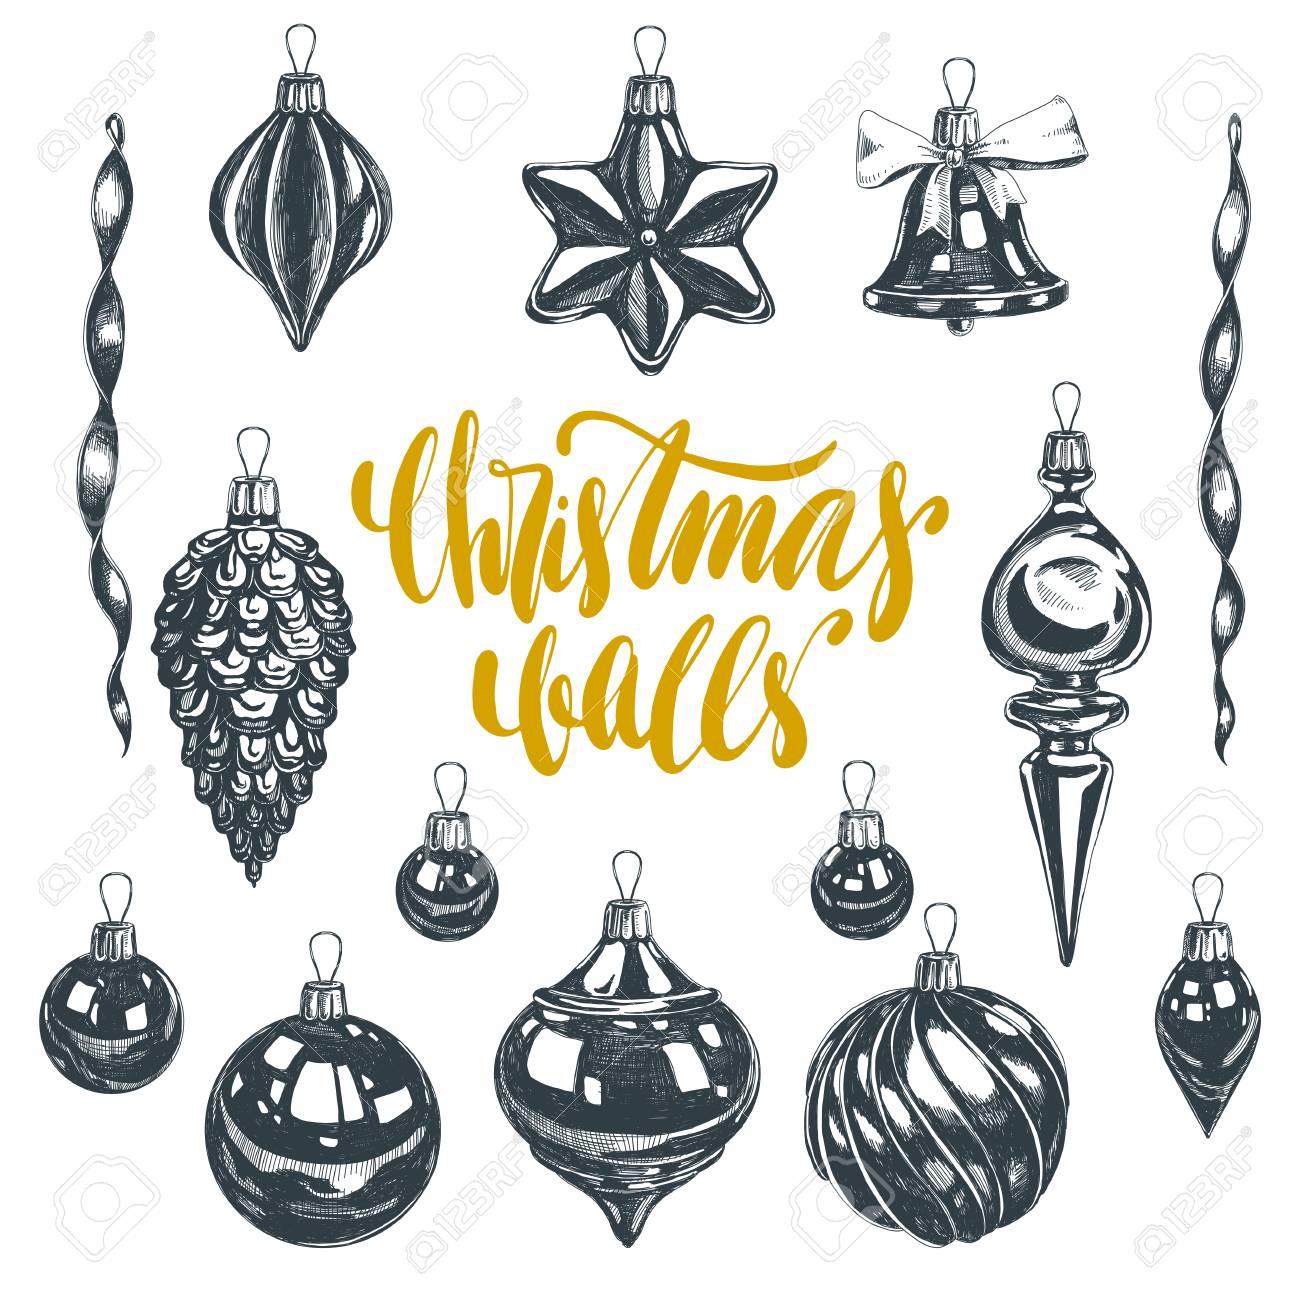 Christmas Ornament Vector.Beautiful Vector Hand Drawn Christmas Ornaments Illustrations